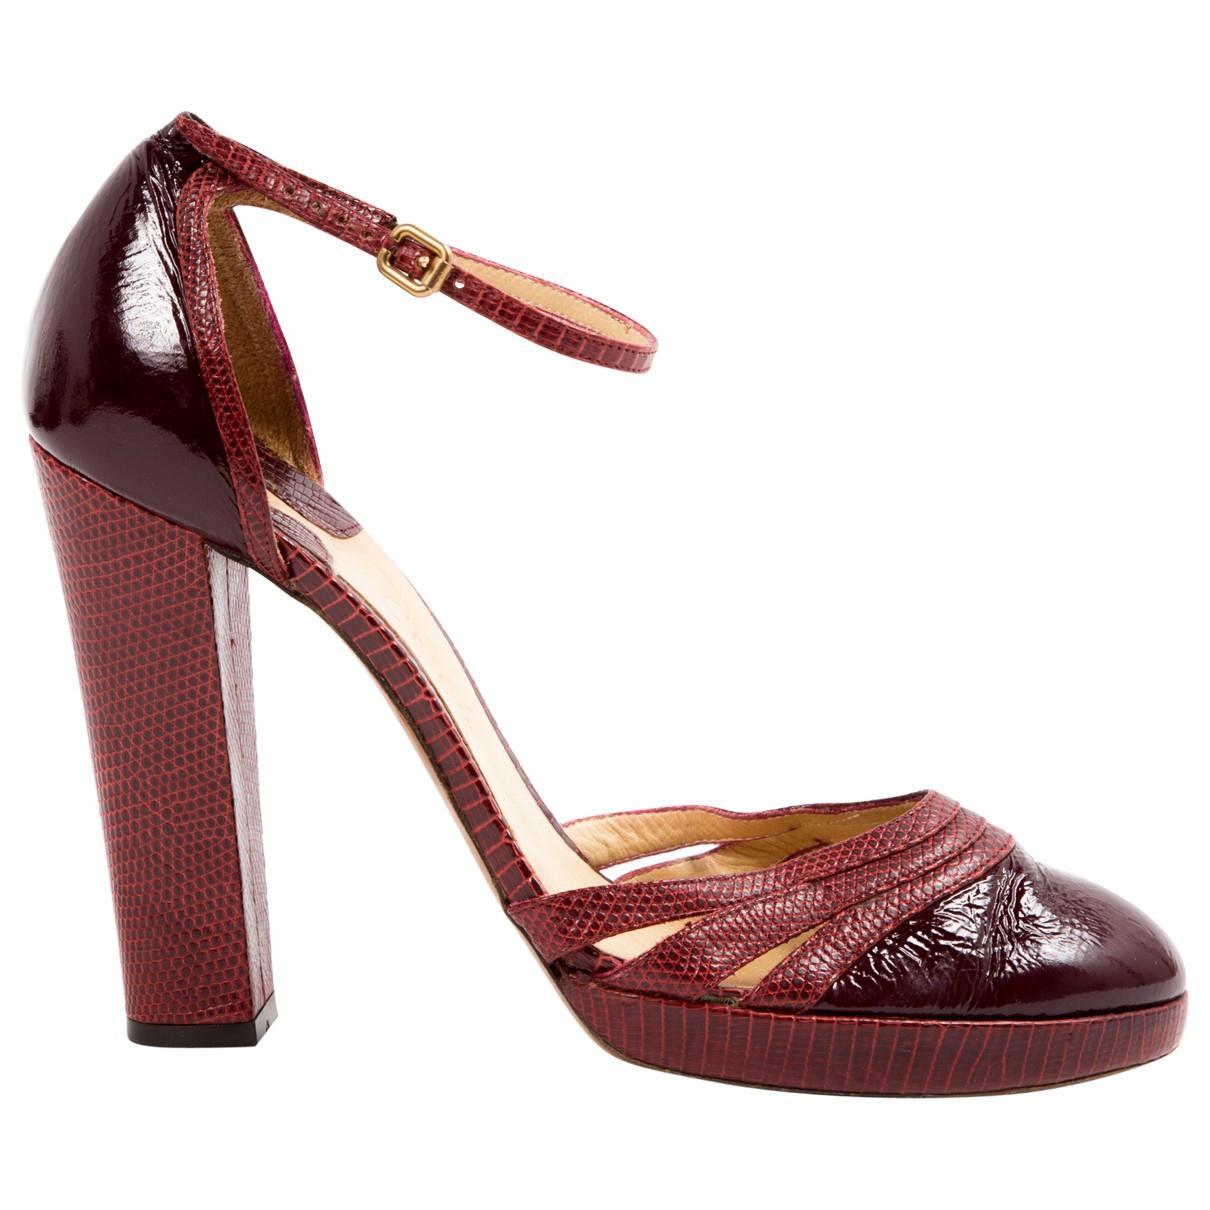 Pre-owned - Lizard heels Chlo iaHIXy